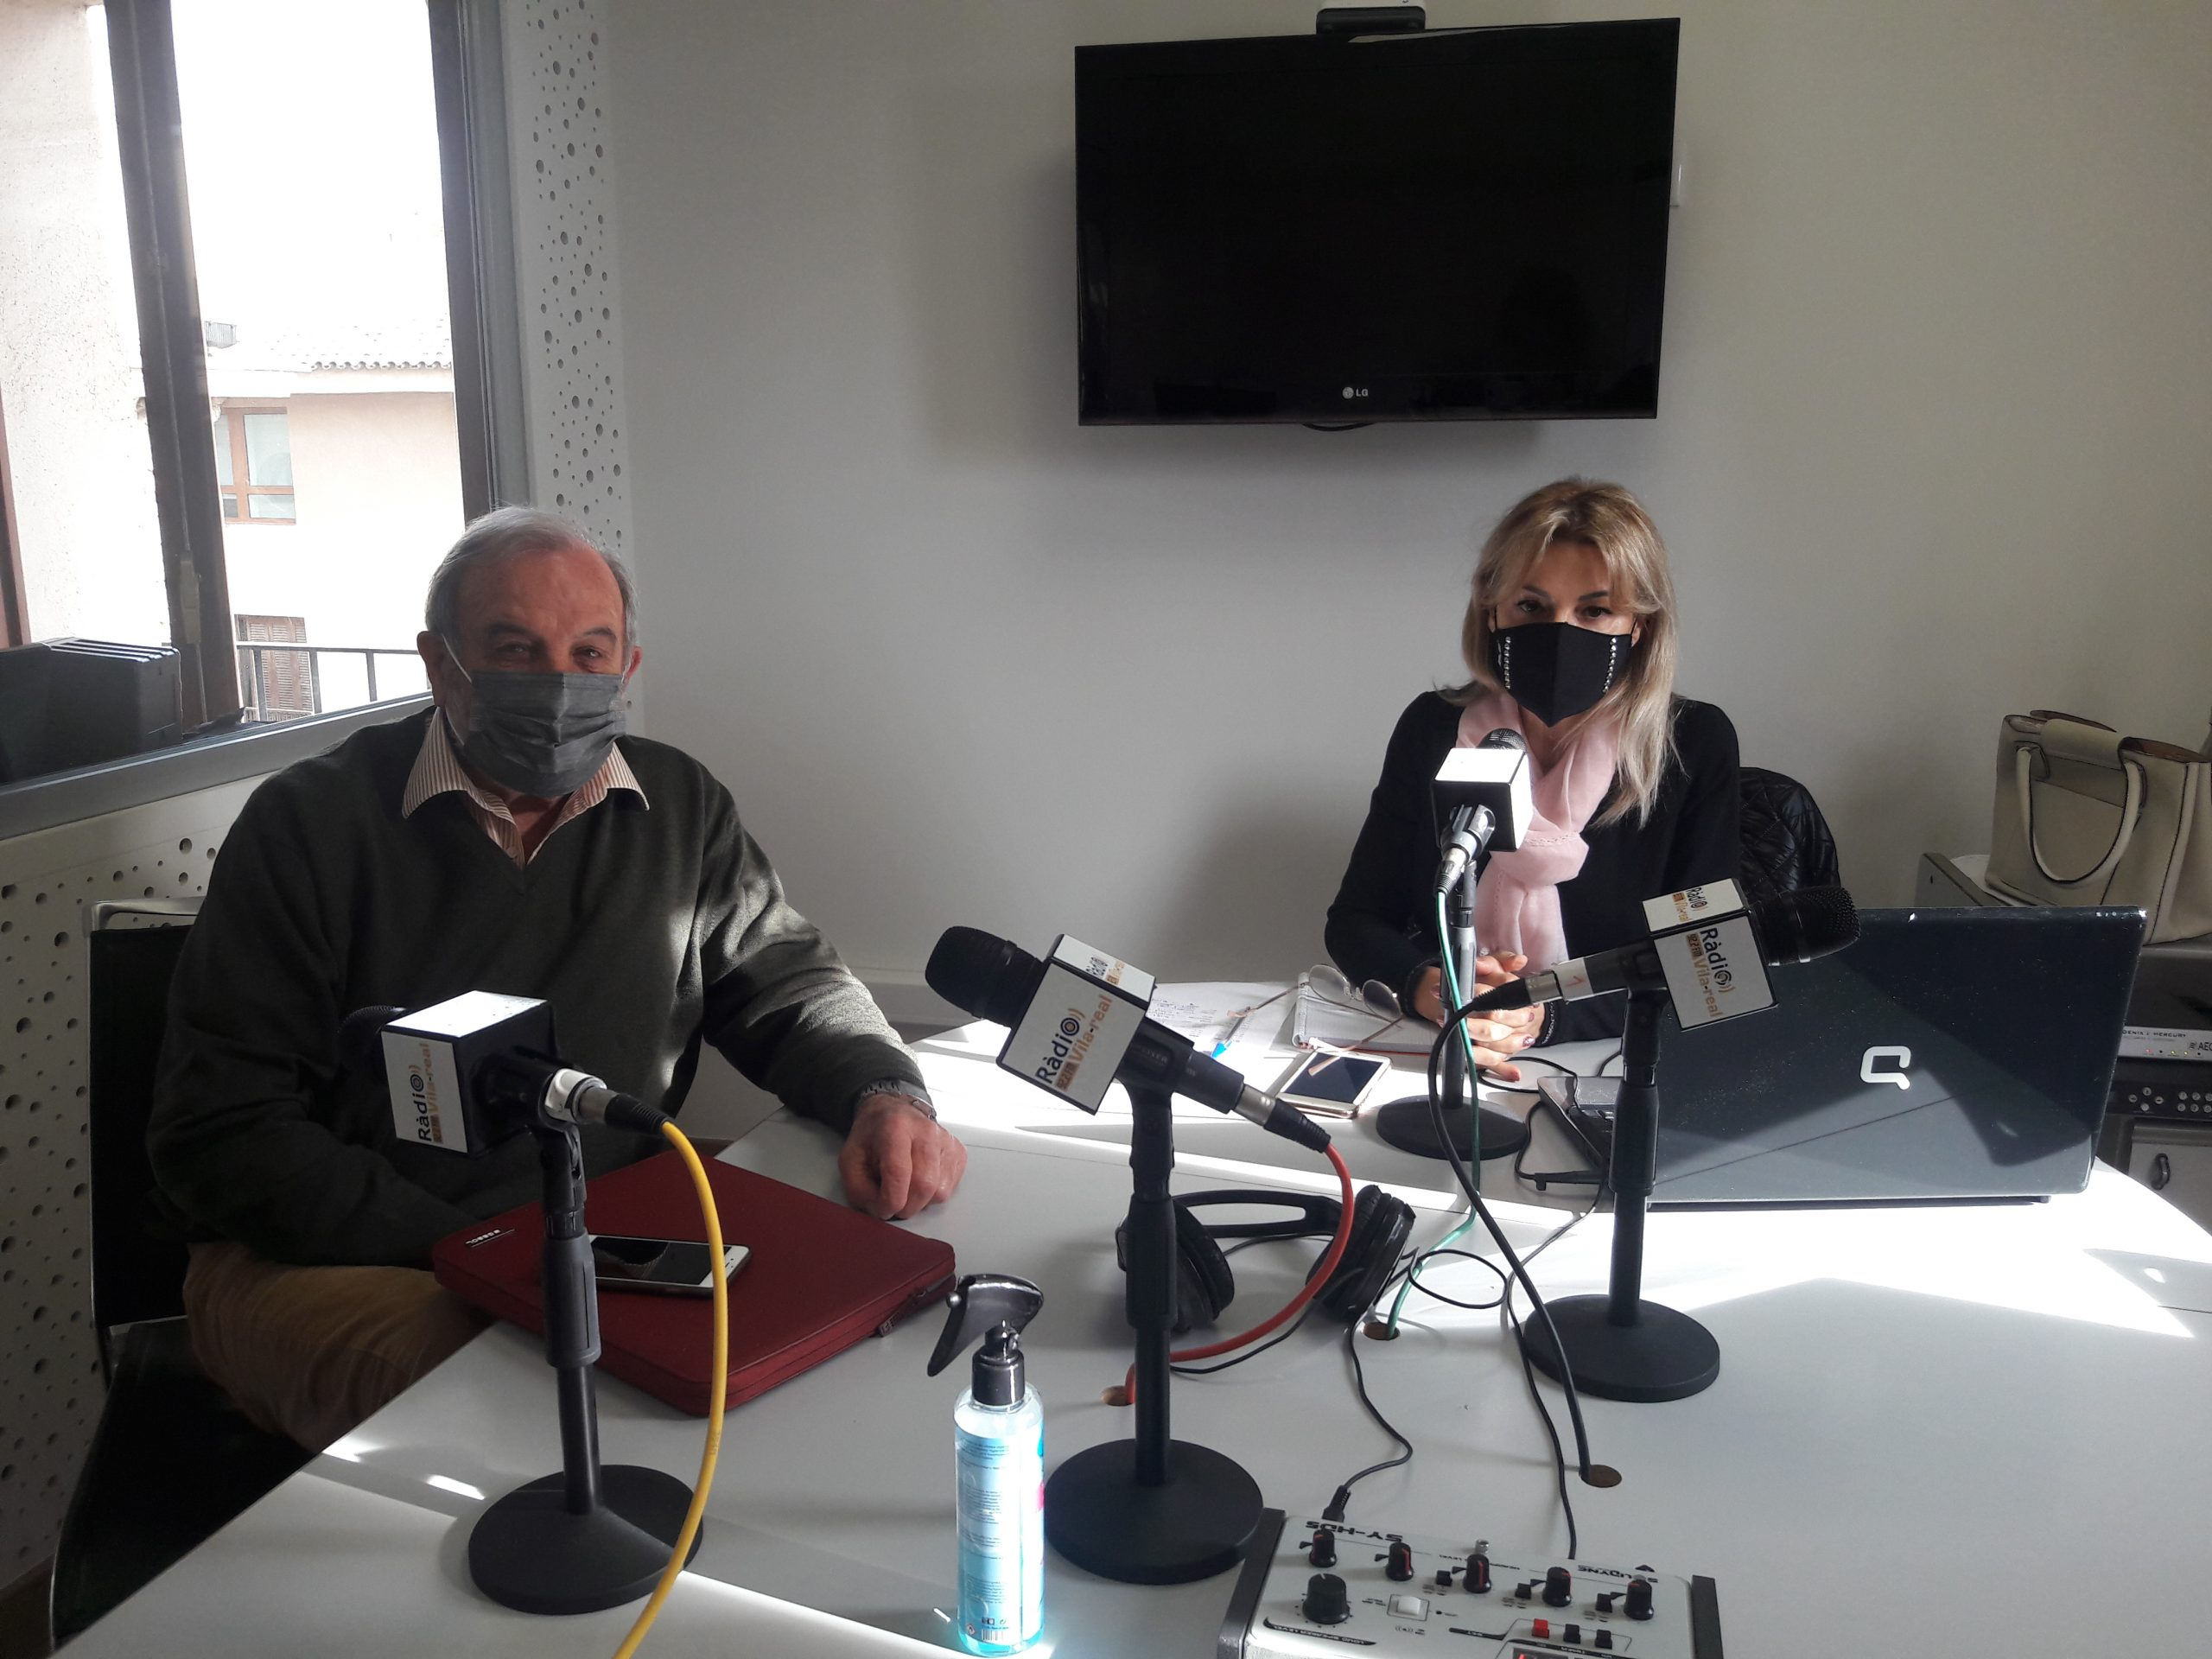 Entrevista al Presidente de Agricultores de Nules, Pepe Montagut